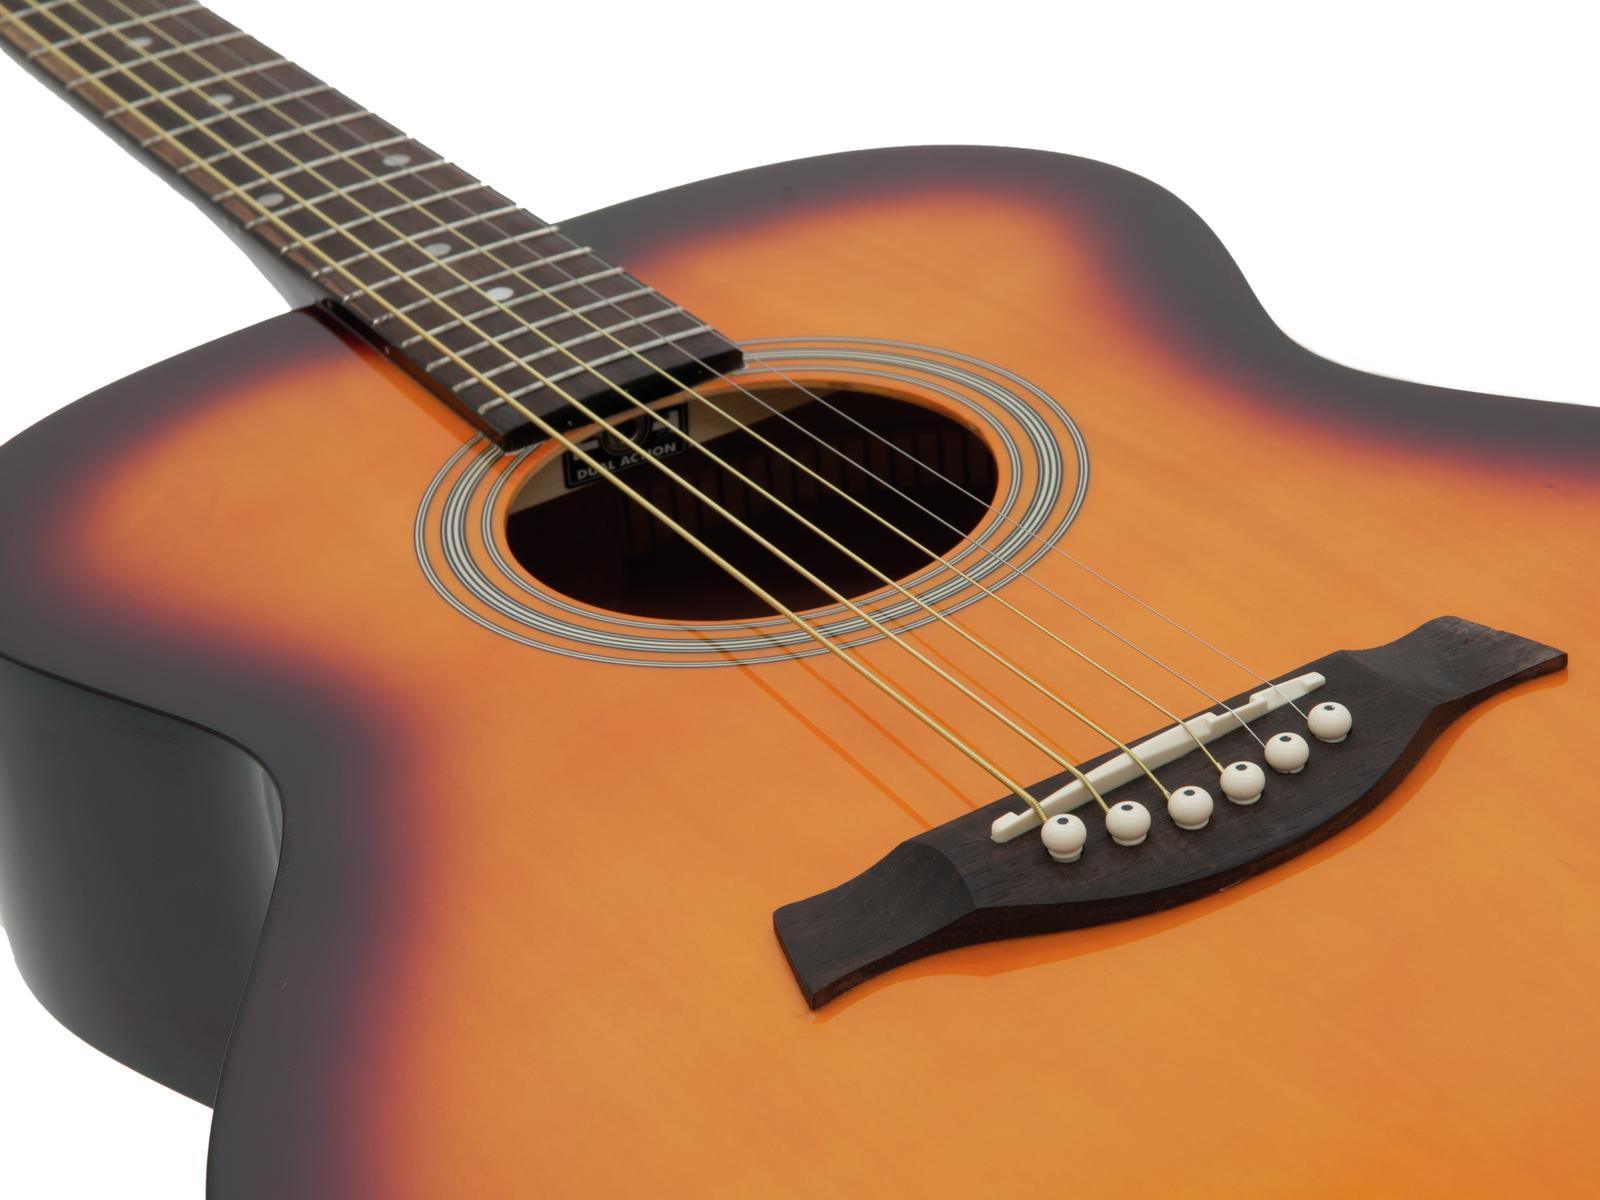 Chitarra acustica, western, colore sunburst, acero, DIMAVERY AW-303